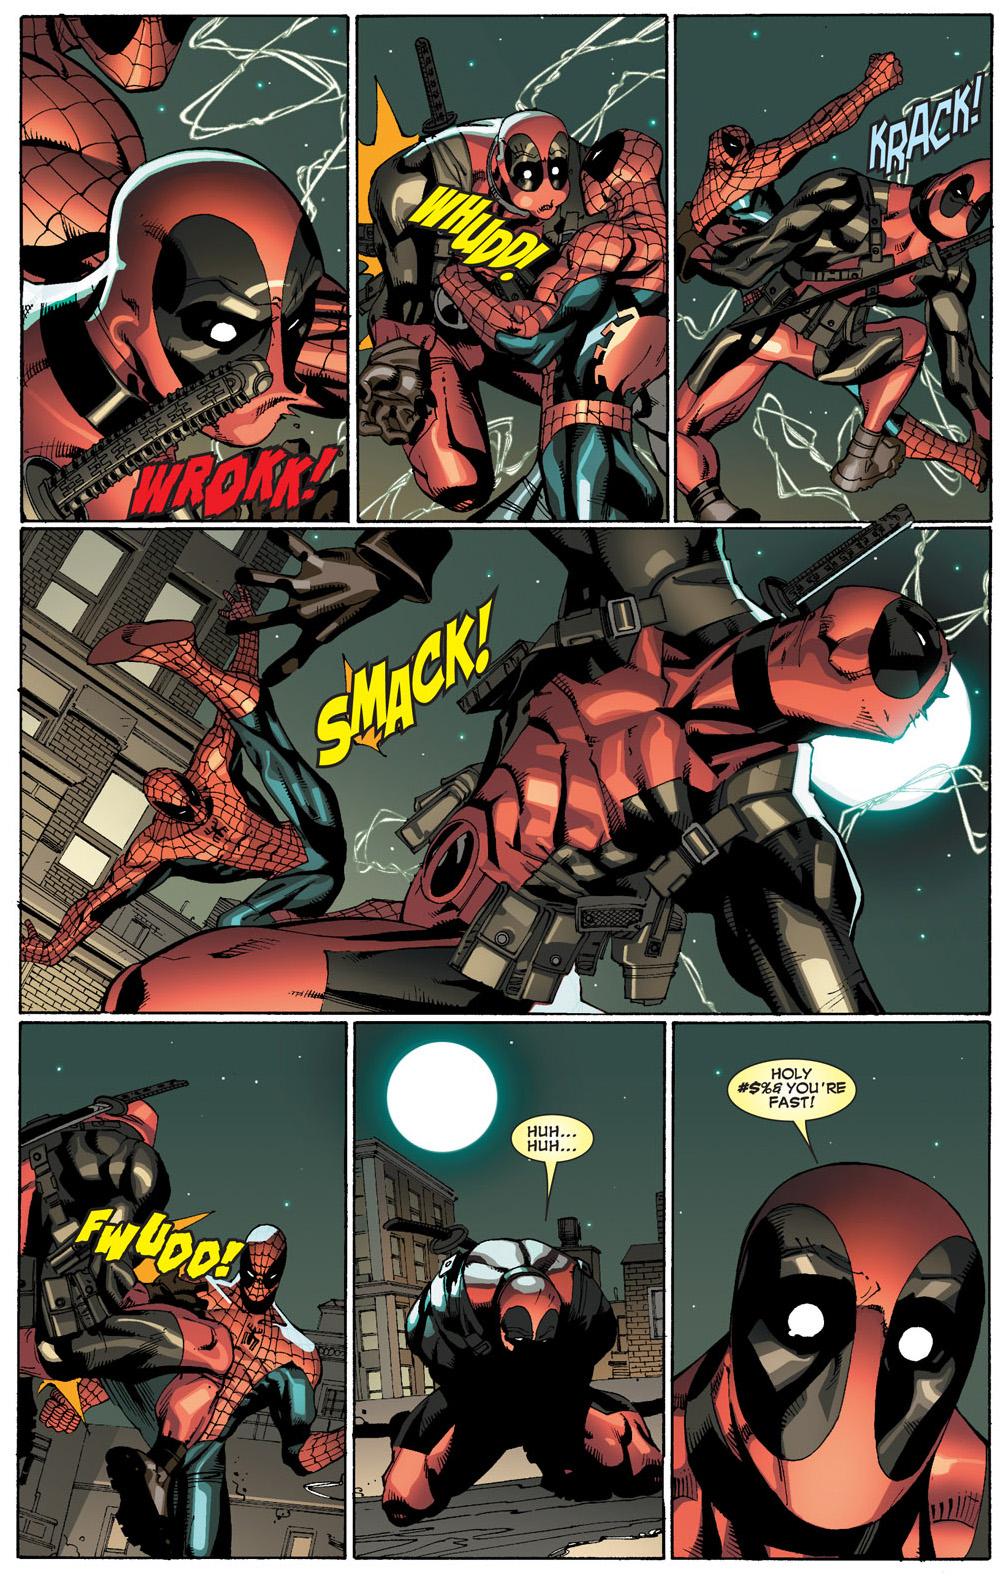 Epic justice attacks - 2 4